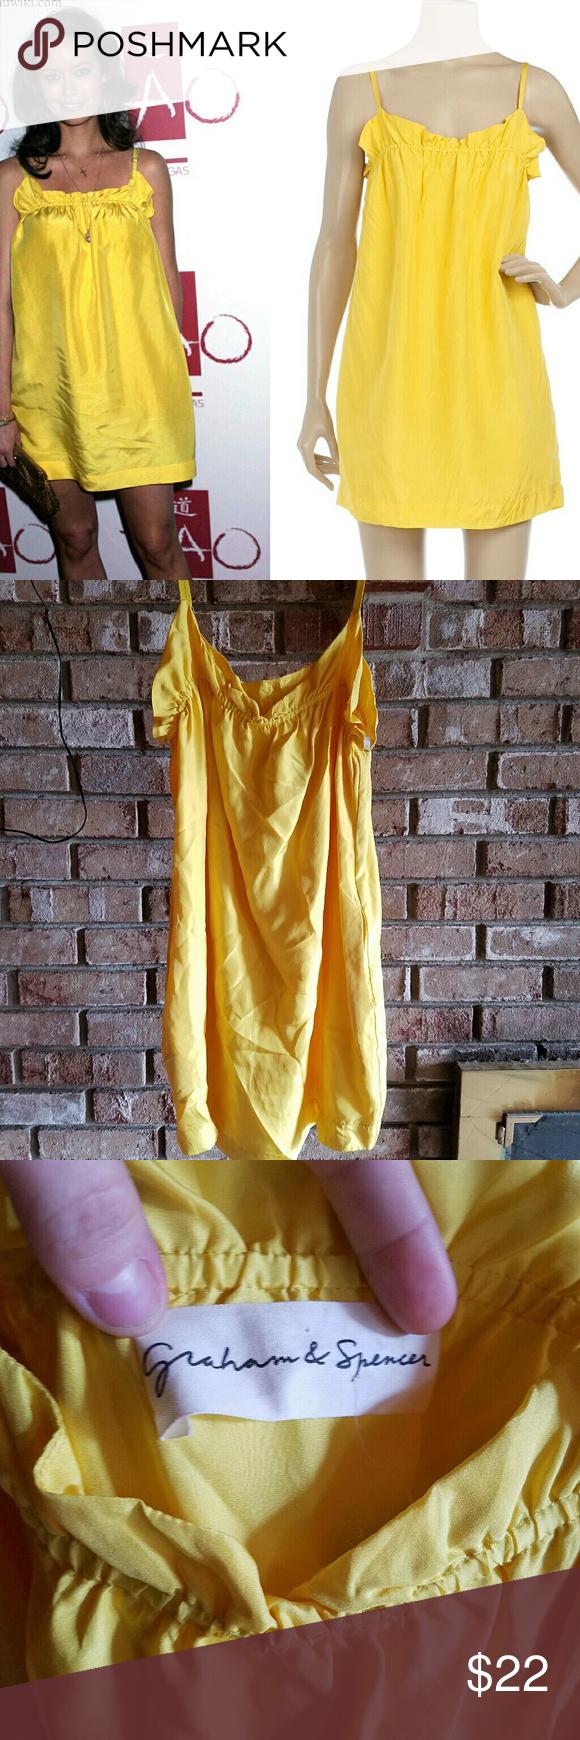 Defect dress yellow